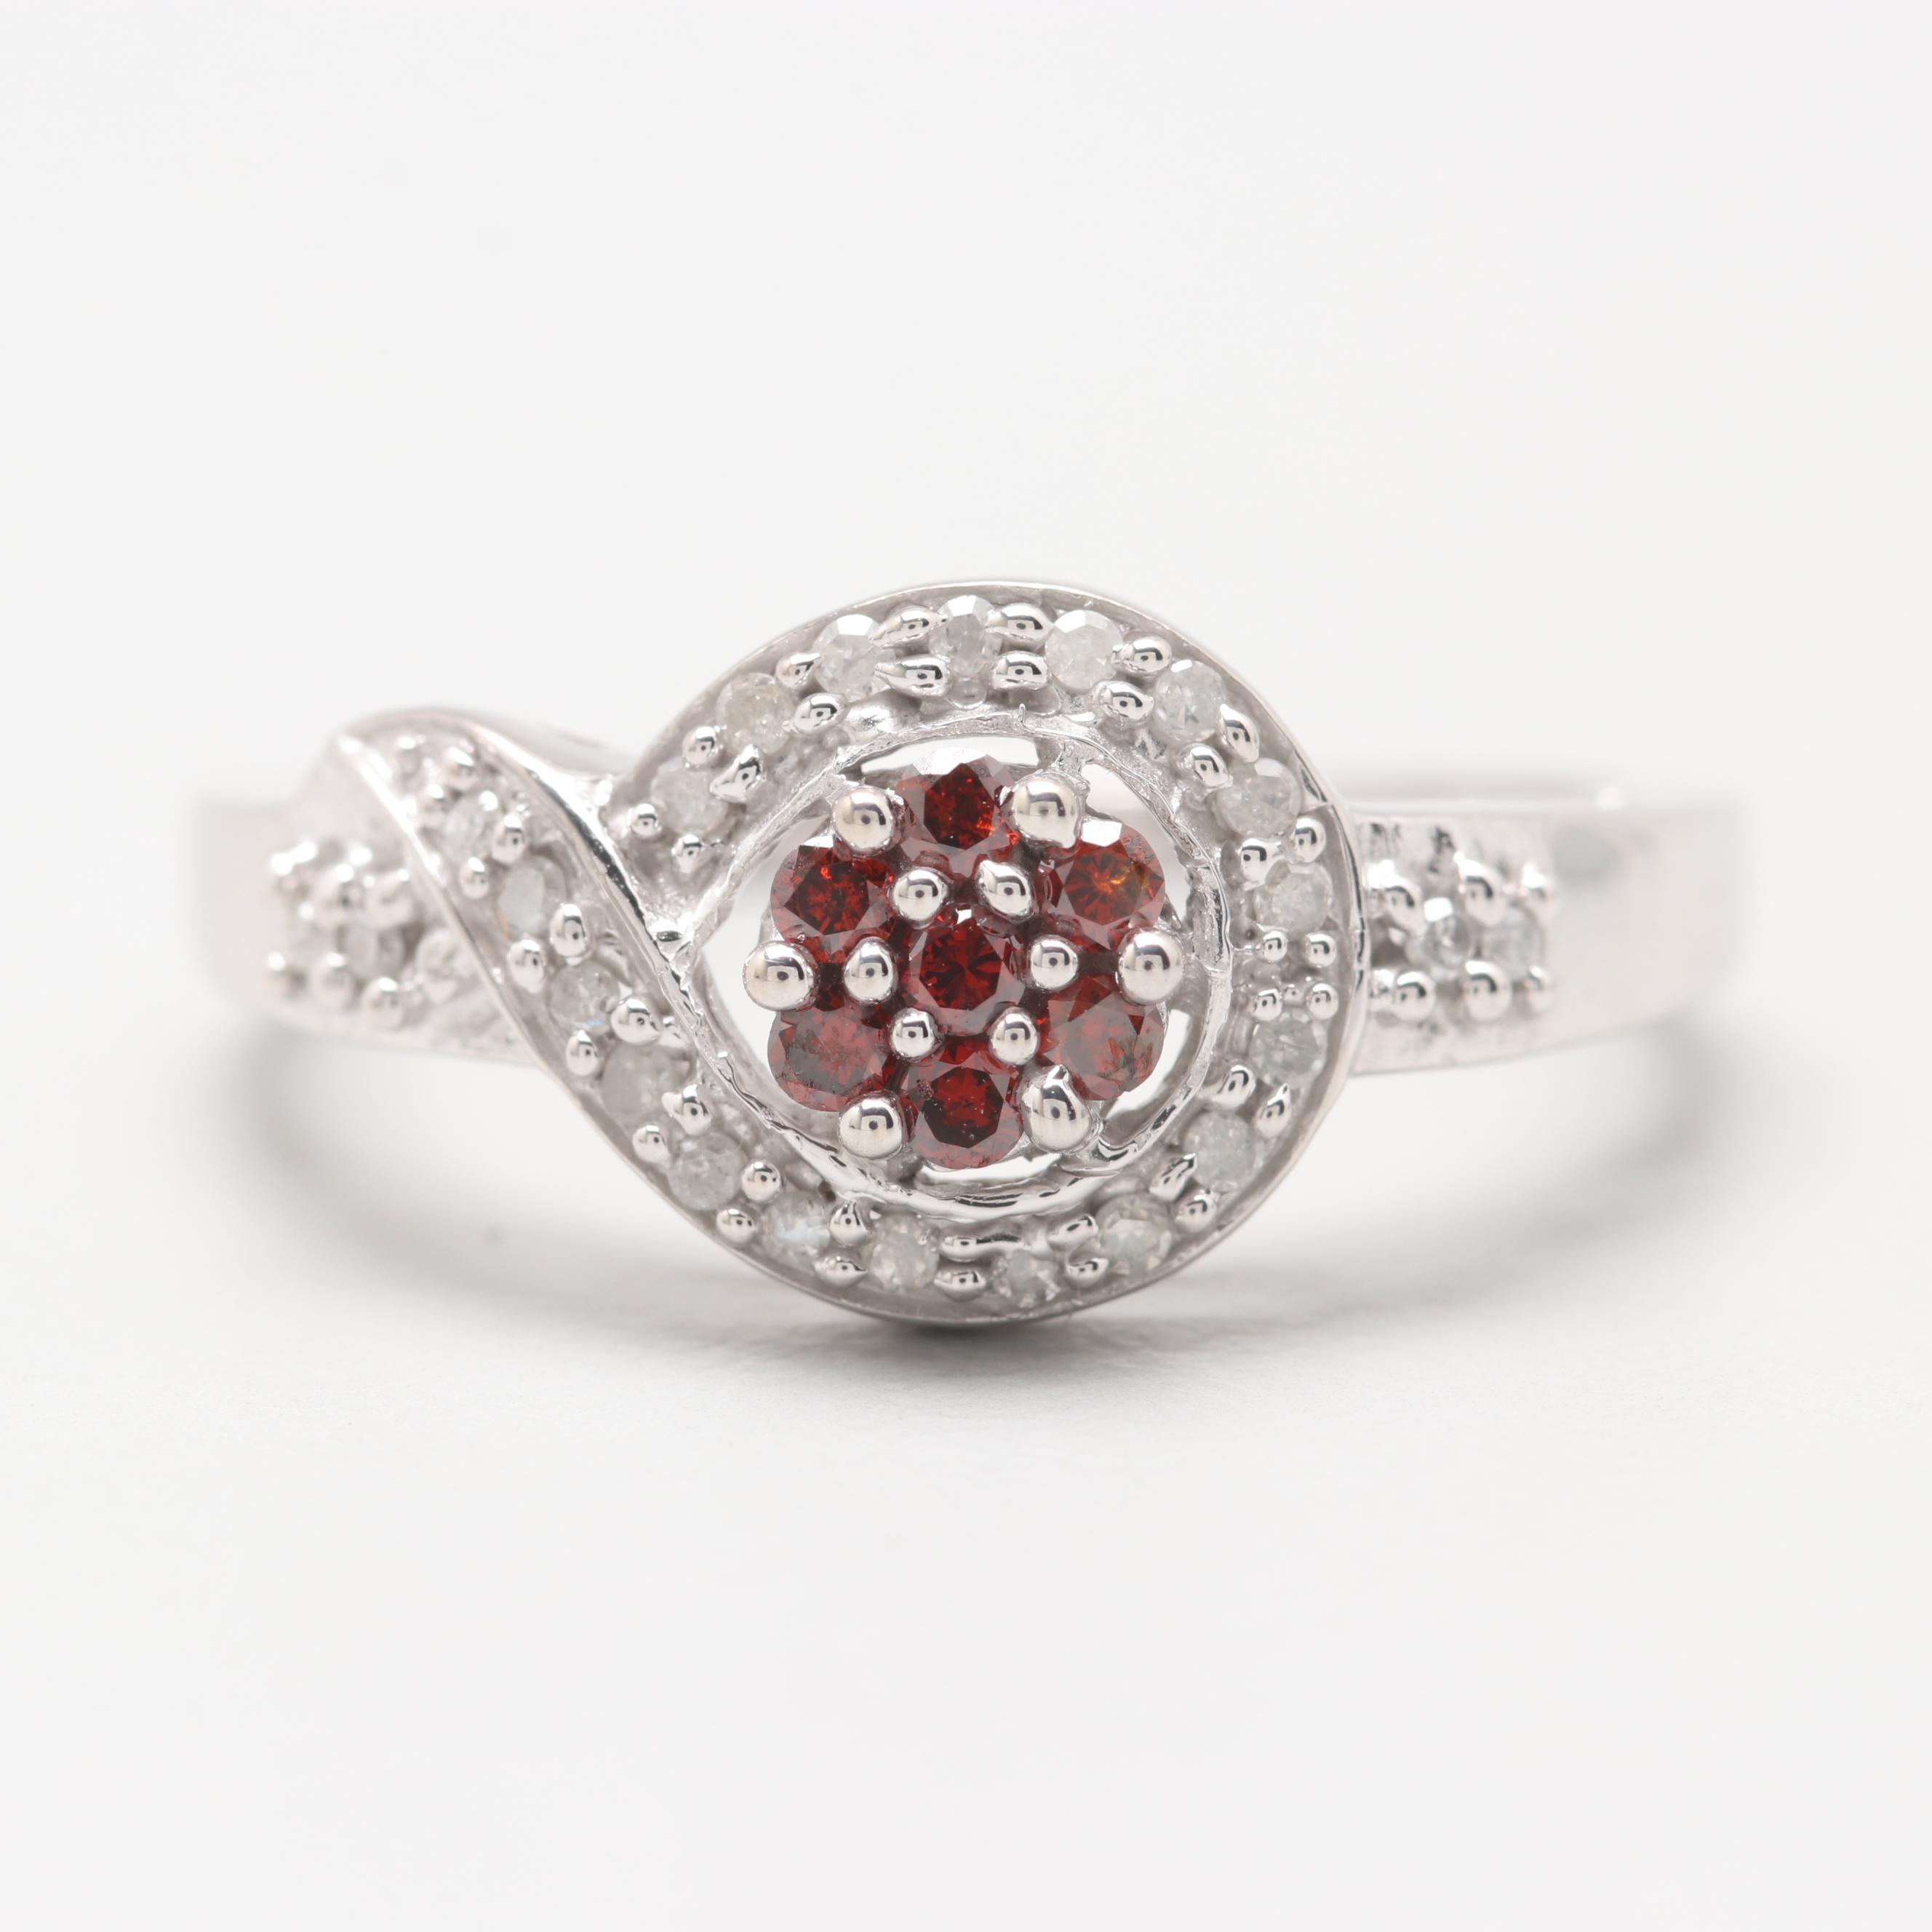 10K White Gold Diamond Ring with Reddish Brown Diamonds